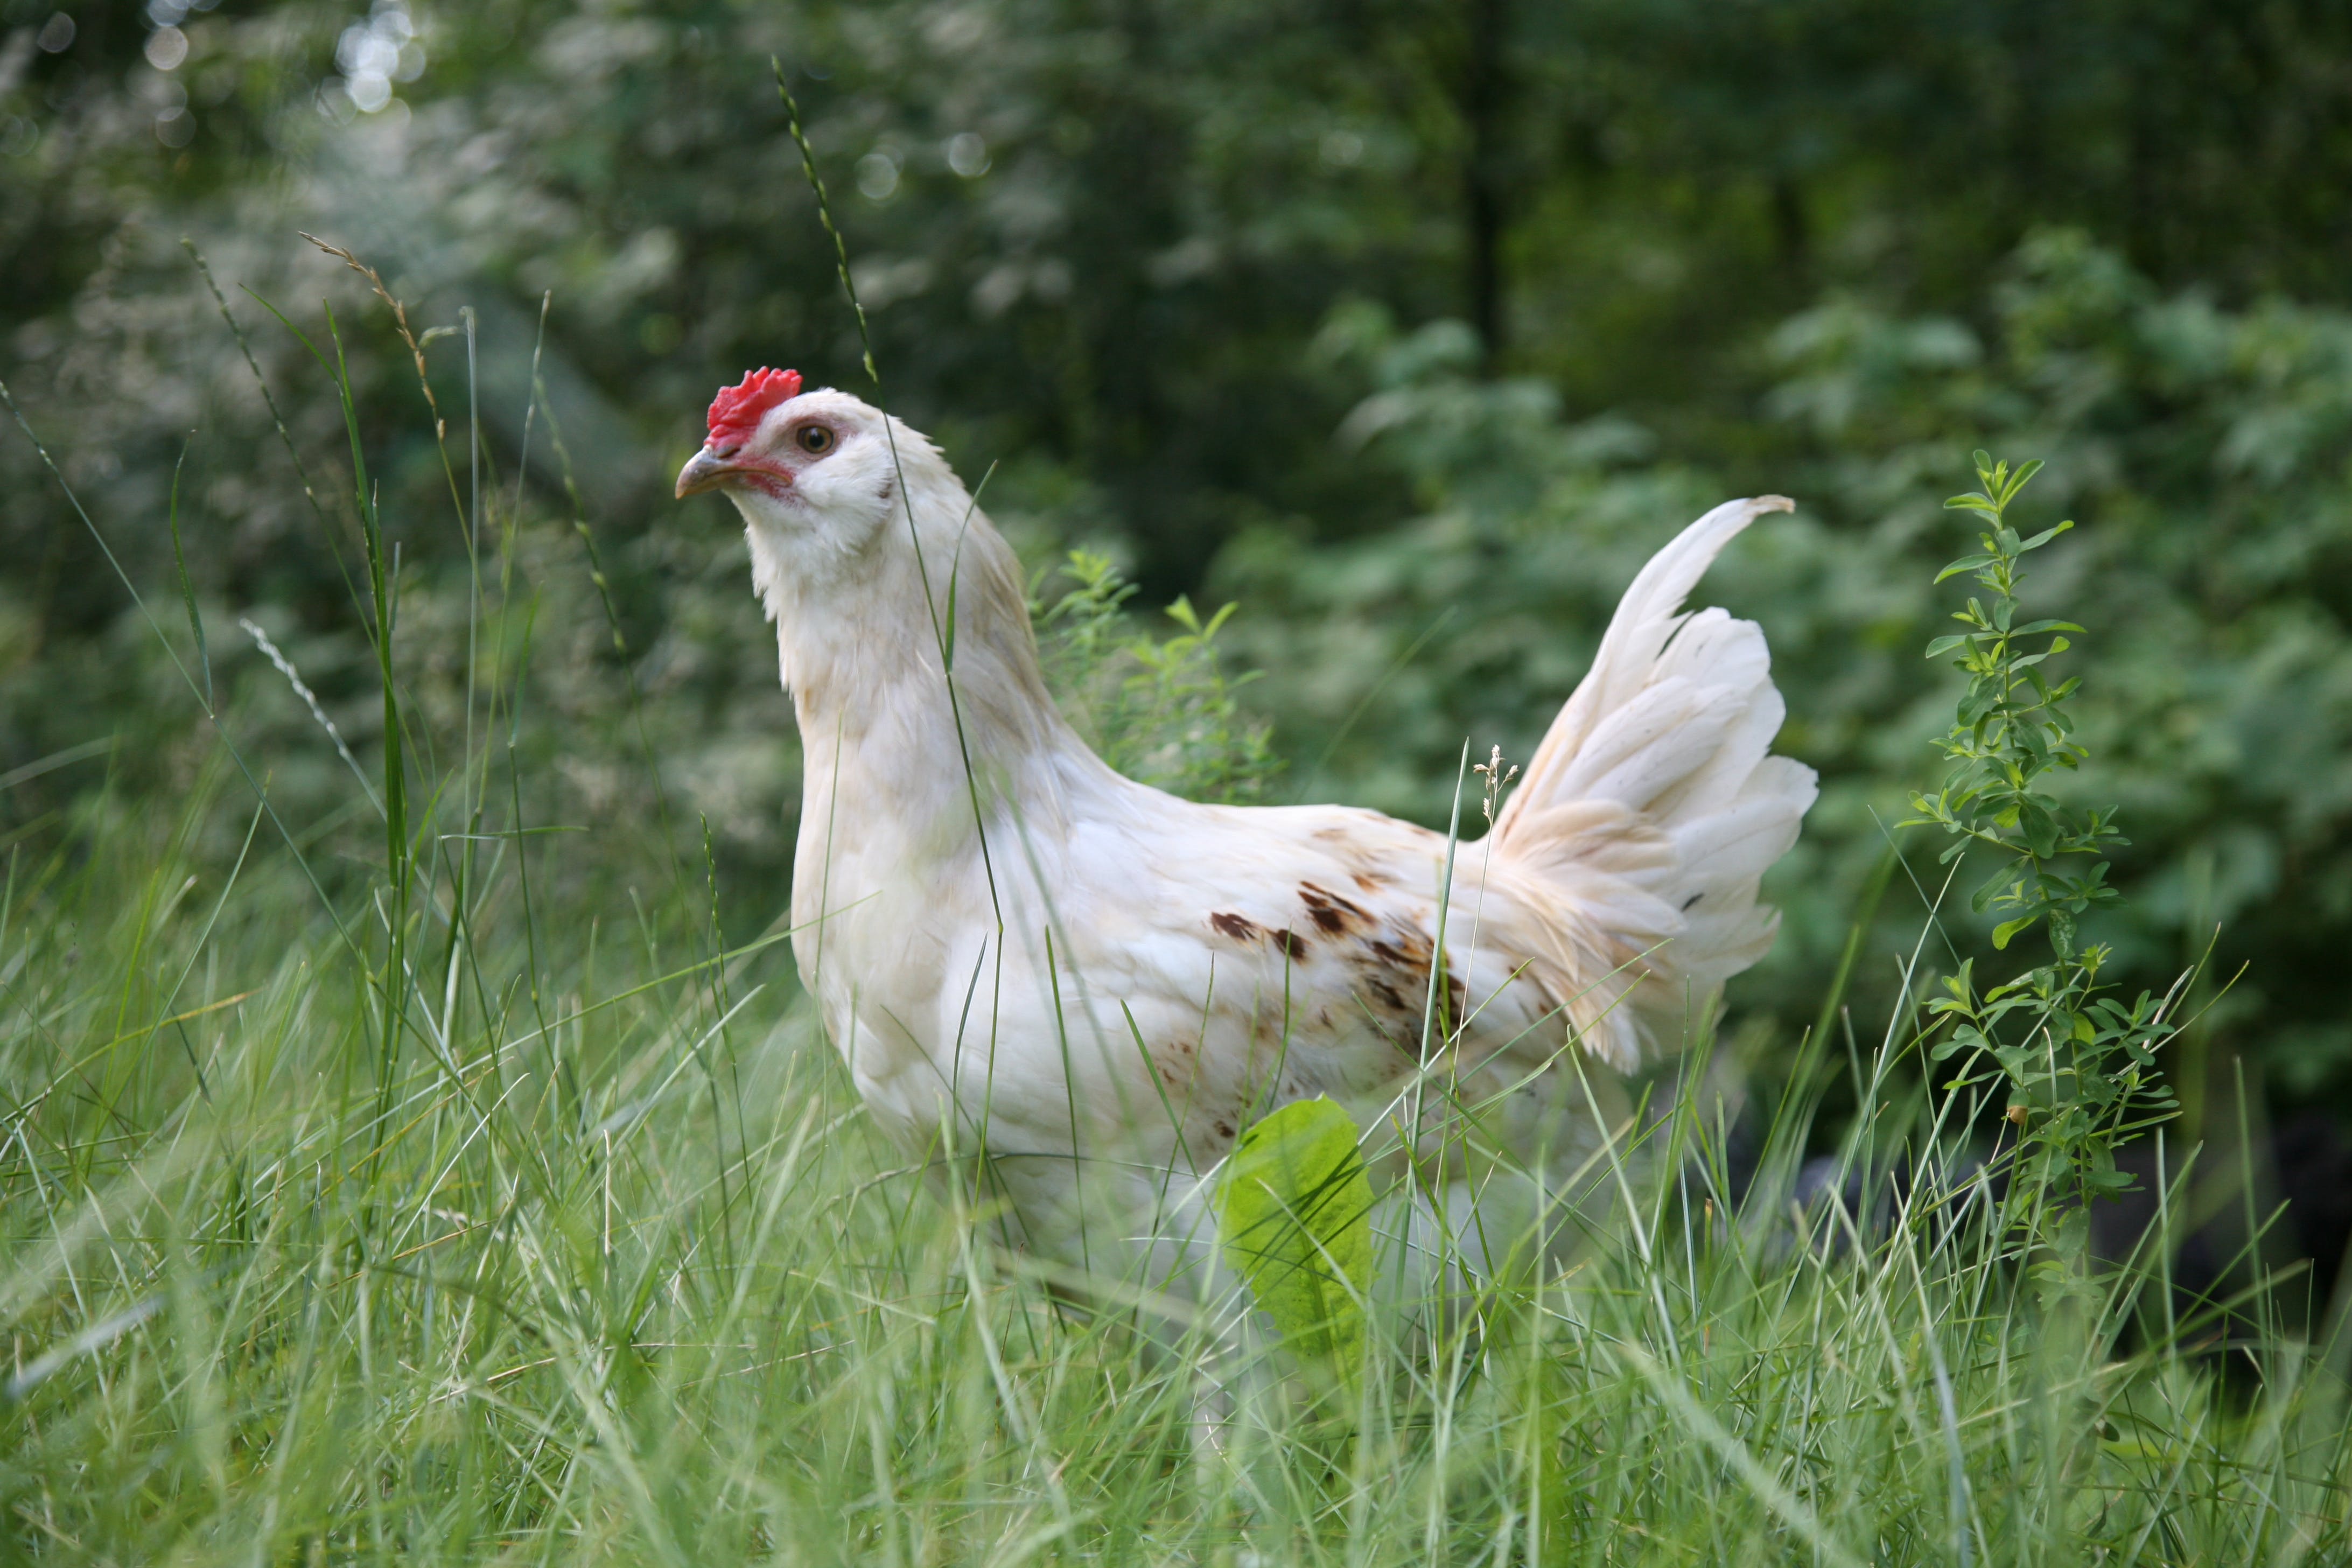 agriculture, beak, bird